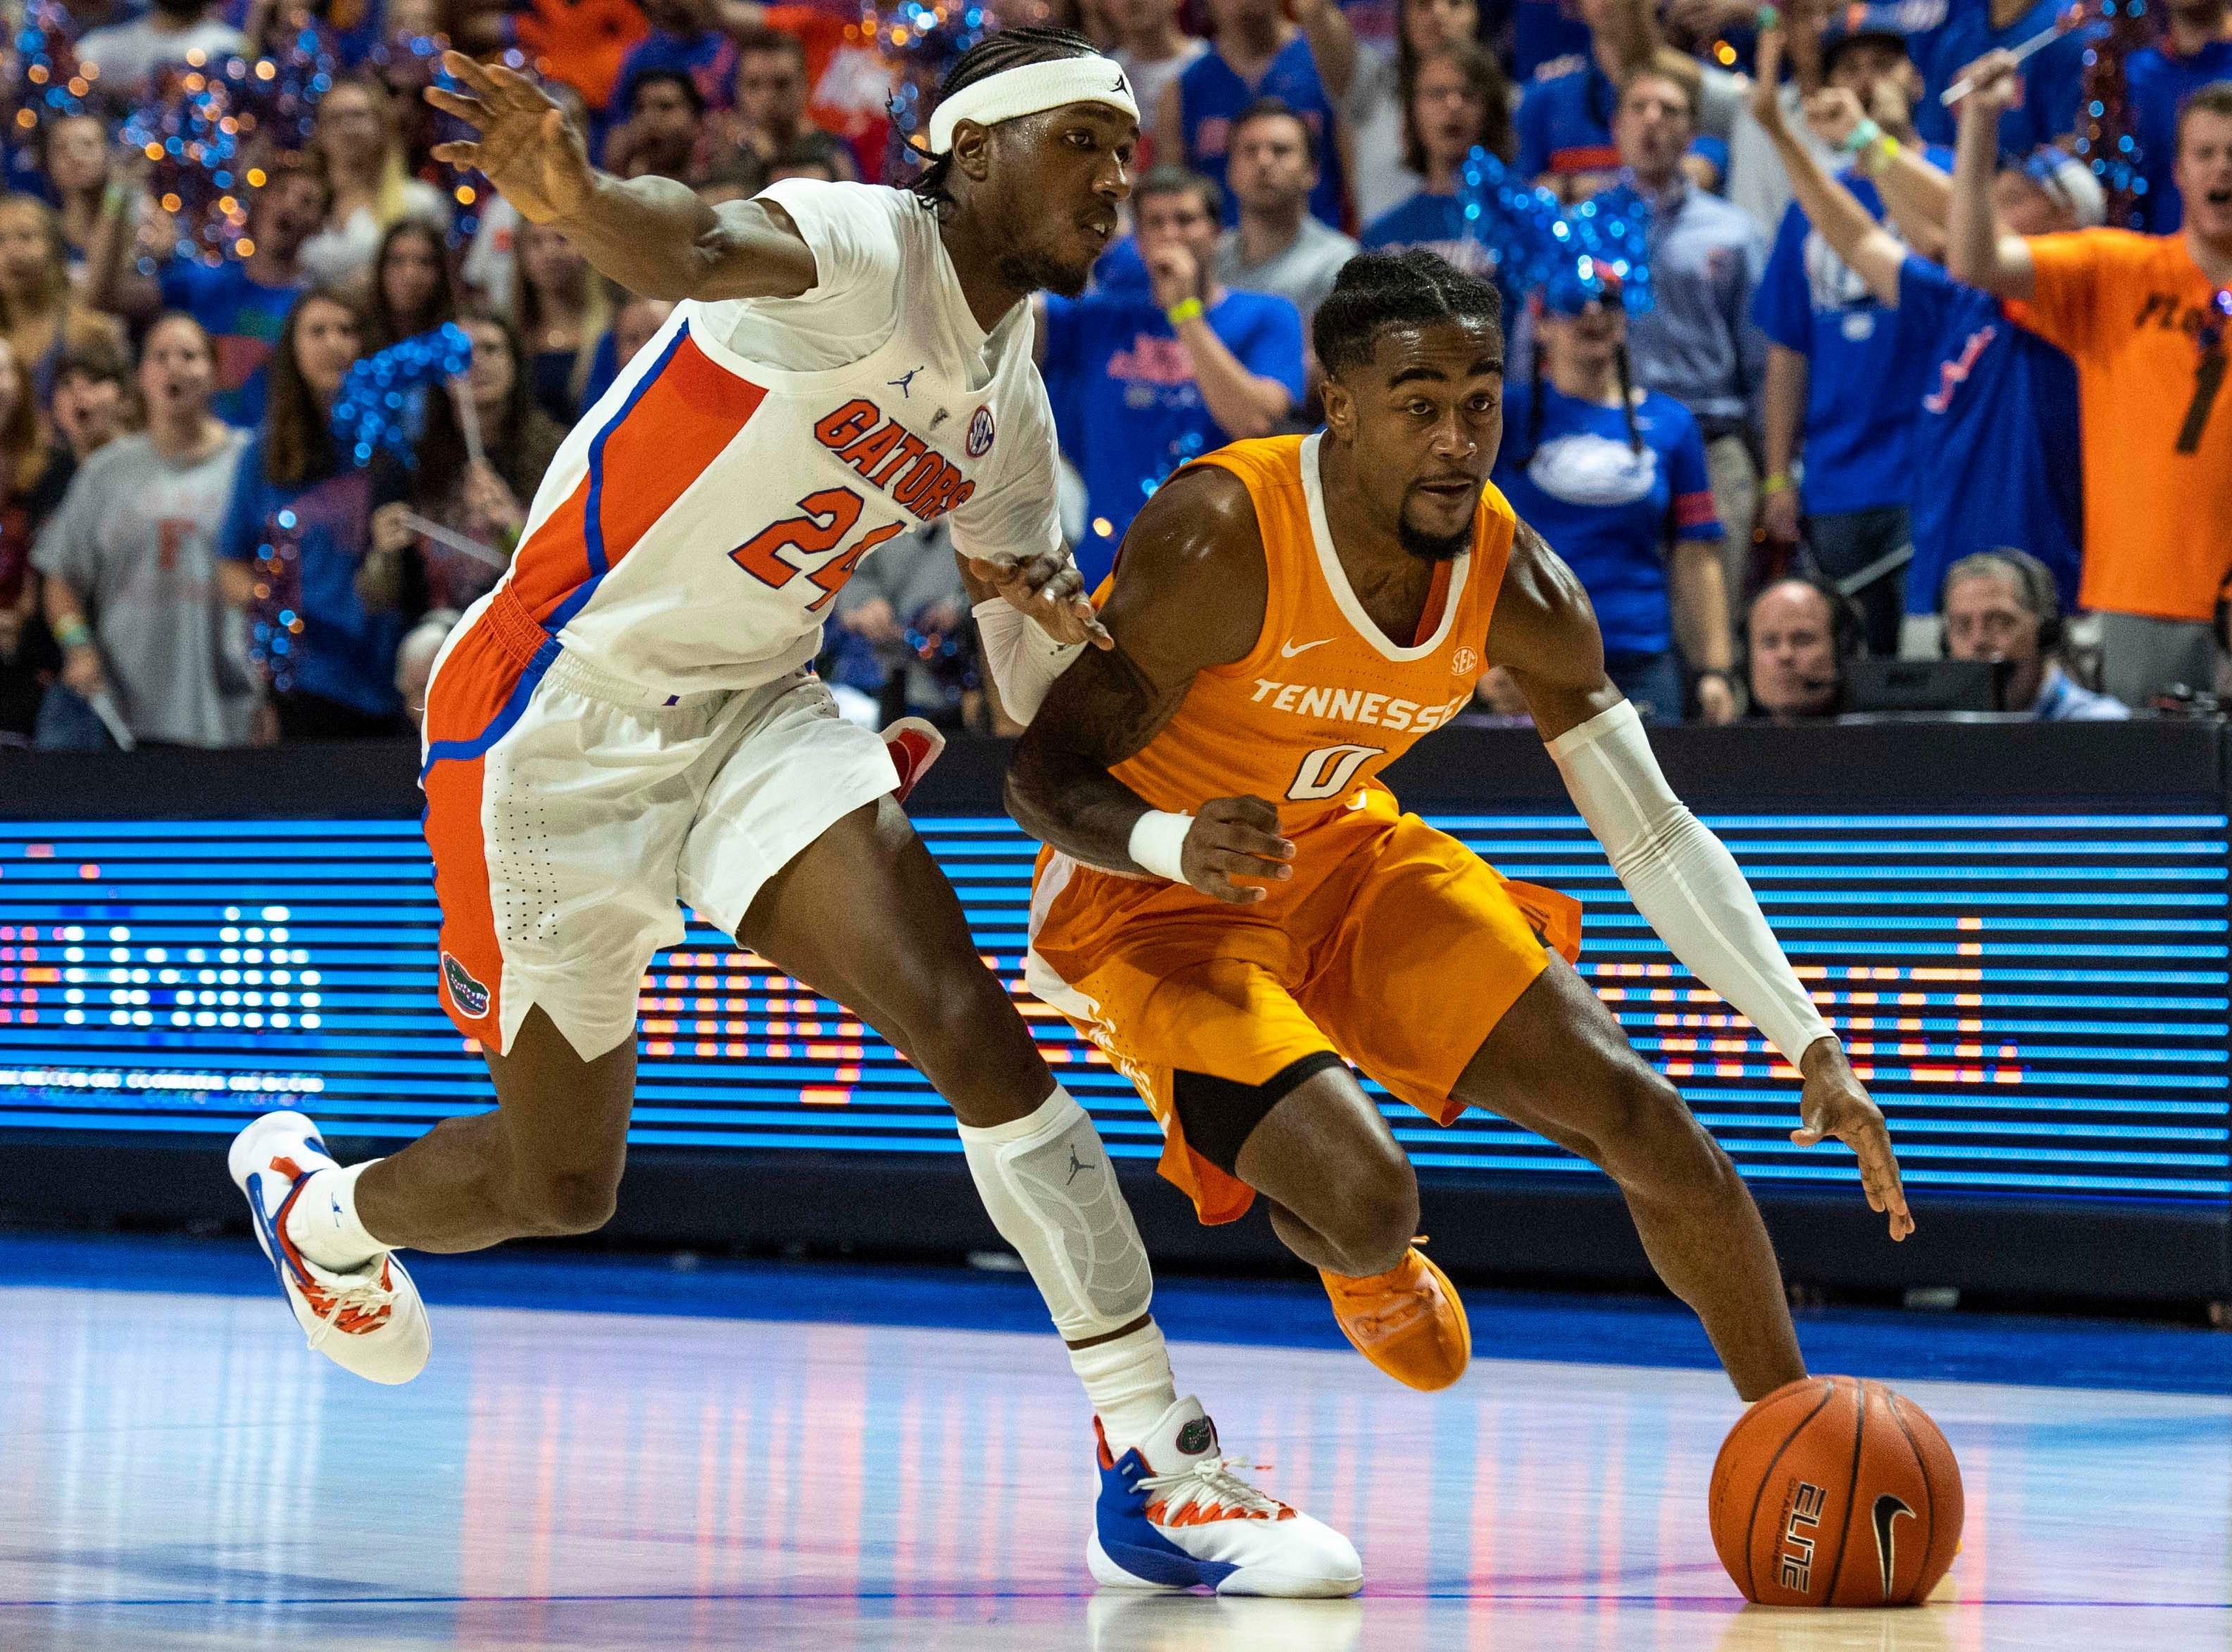 Tennessee Volunteers guard Jordan Bone (0) drives for the basket as Florida Gators guard Deaundrae Ballard (24) defends on Jan. 12, 2019.